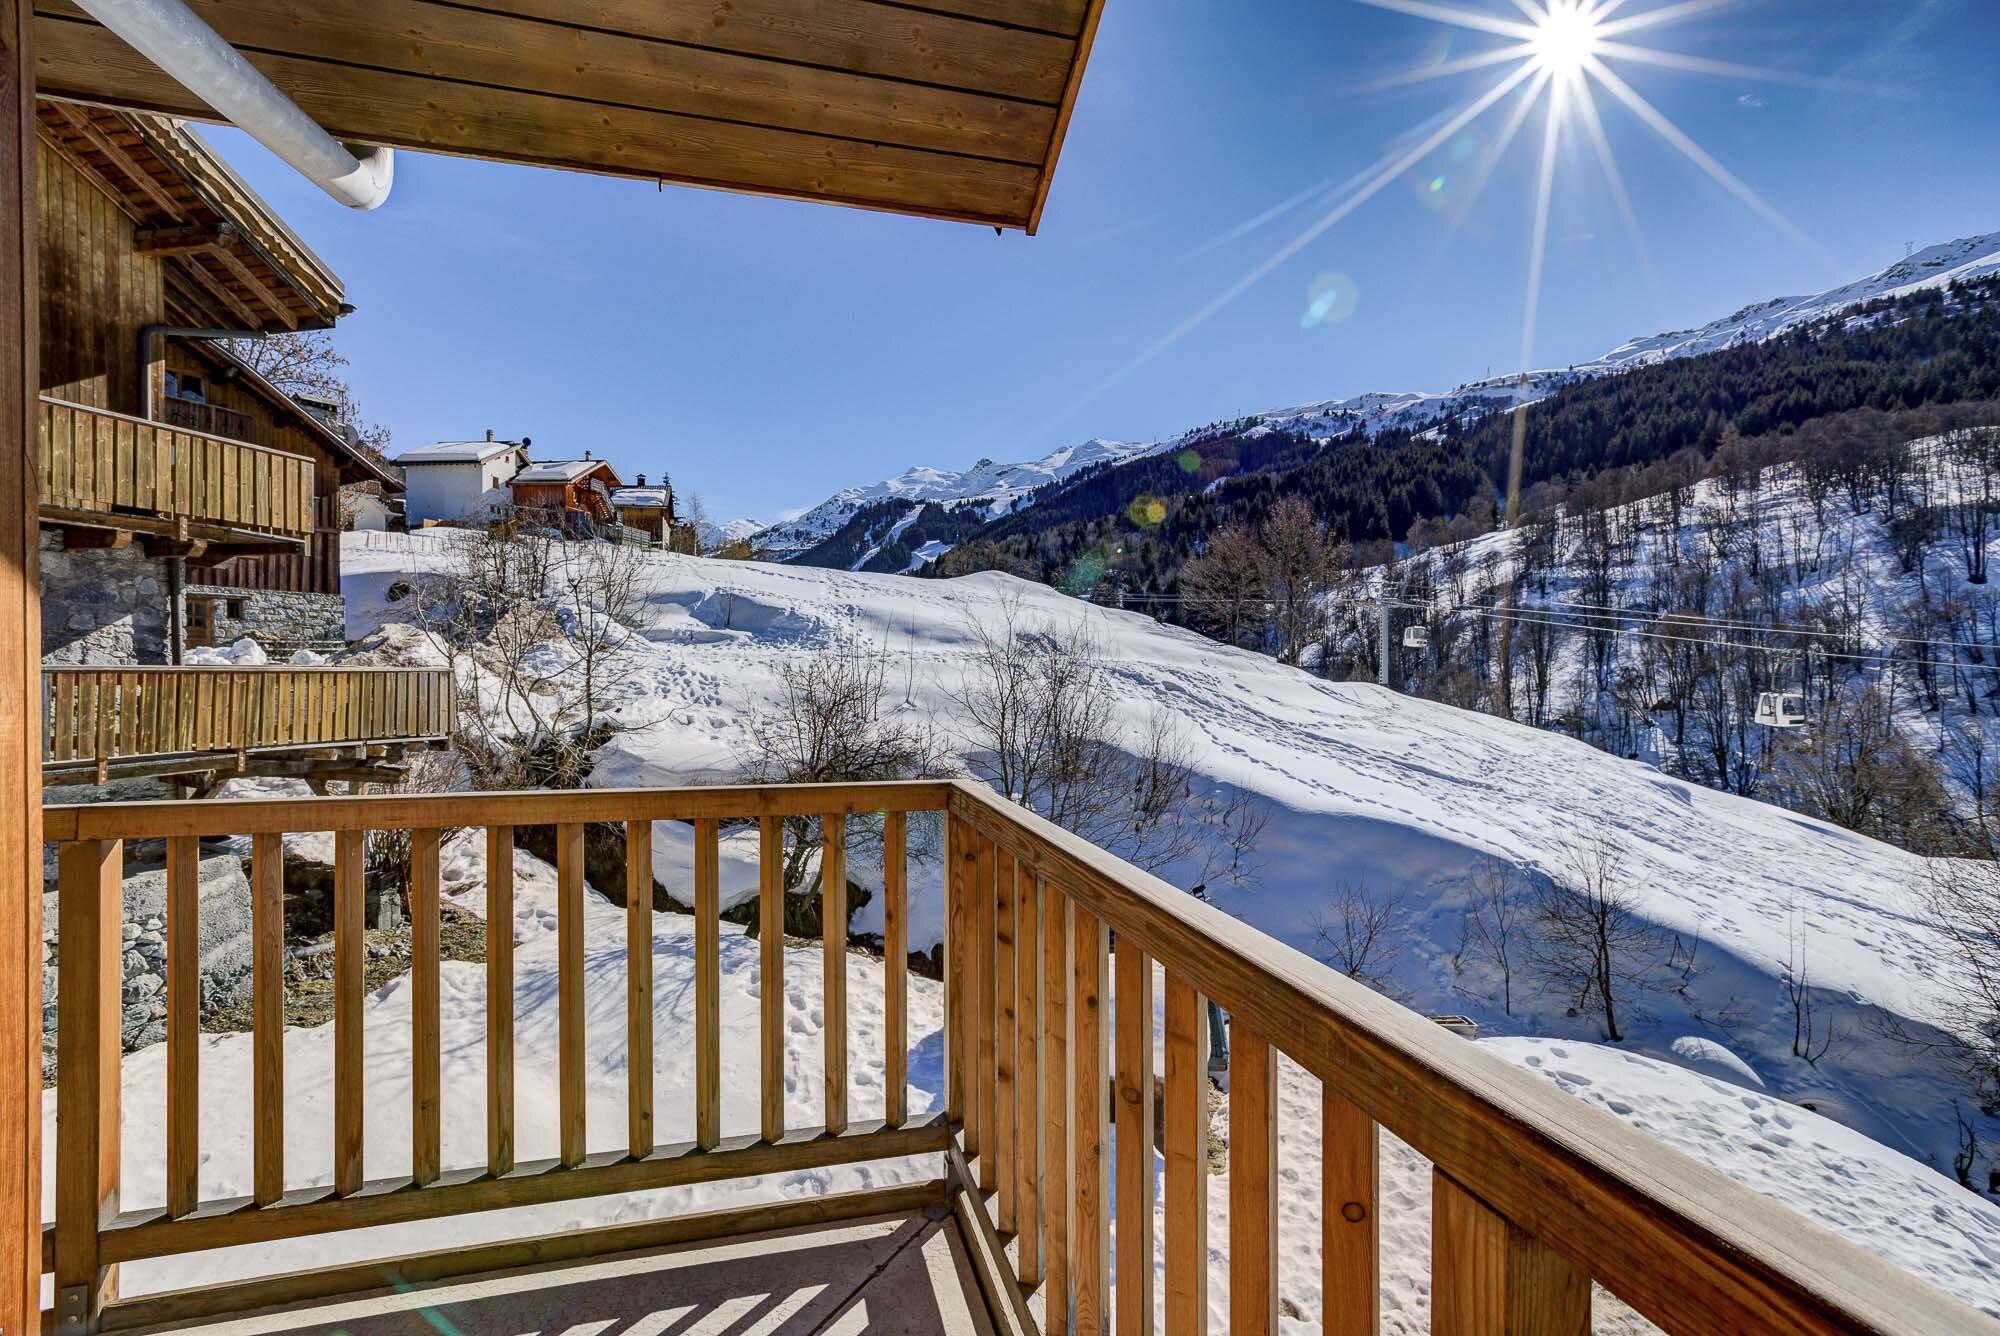 tg-ski-luxury-chalet-lightbowne-meribel-018.jpg